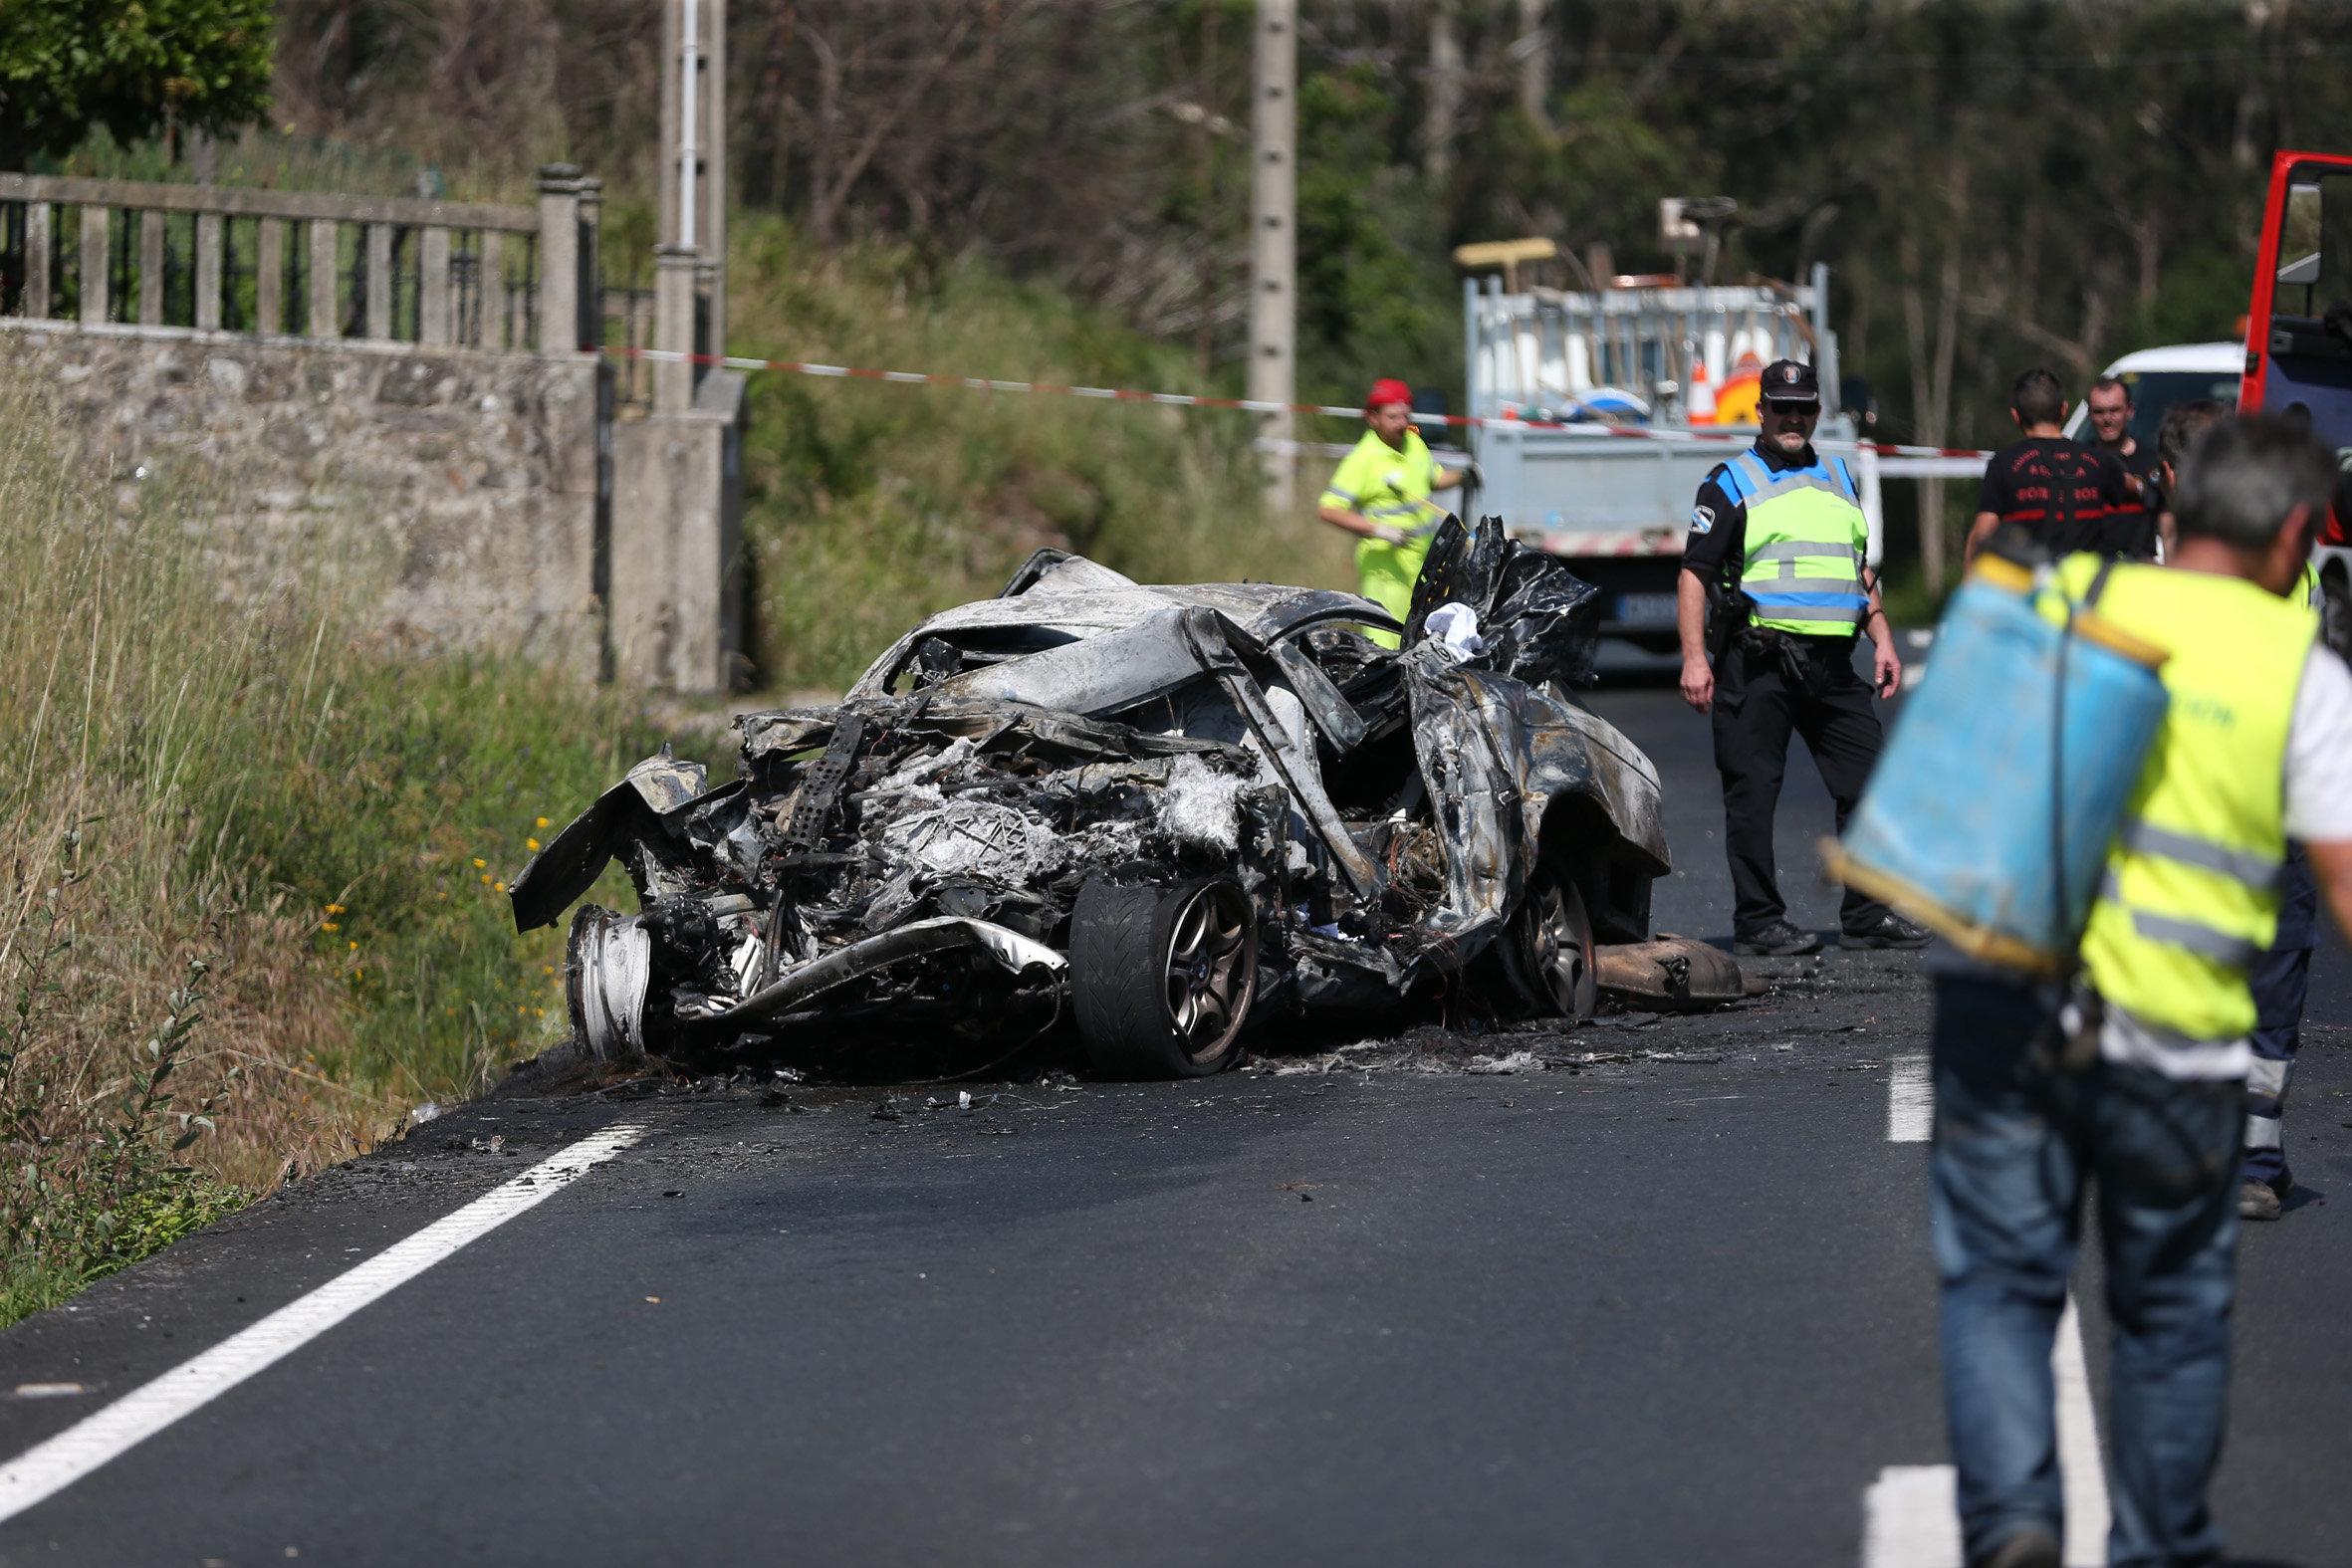 Matrimonio Accidente : Mueren dos personas en un accidente de tráfico rianxo